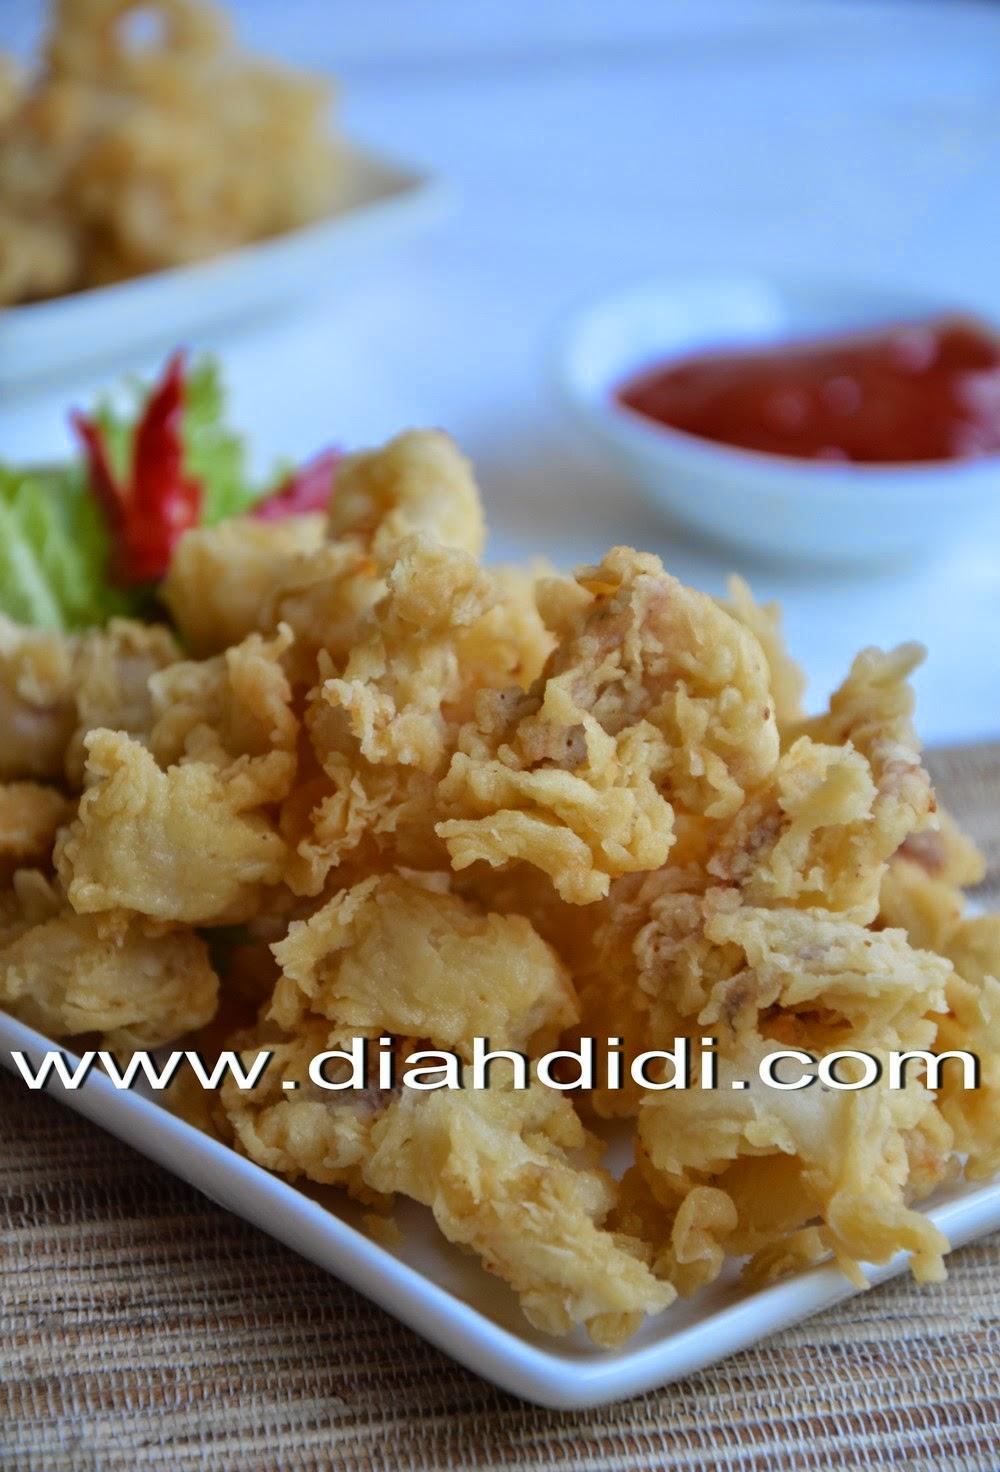 Diah Didi S Kitchen Cumi Goreng Krispi Super Kriukkkk